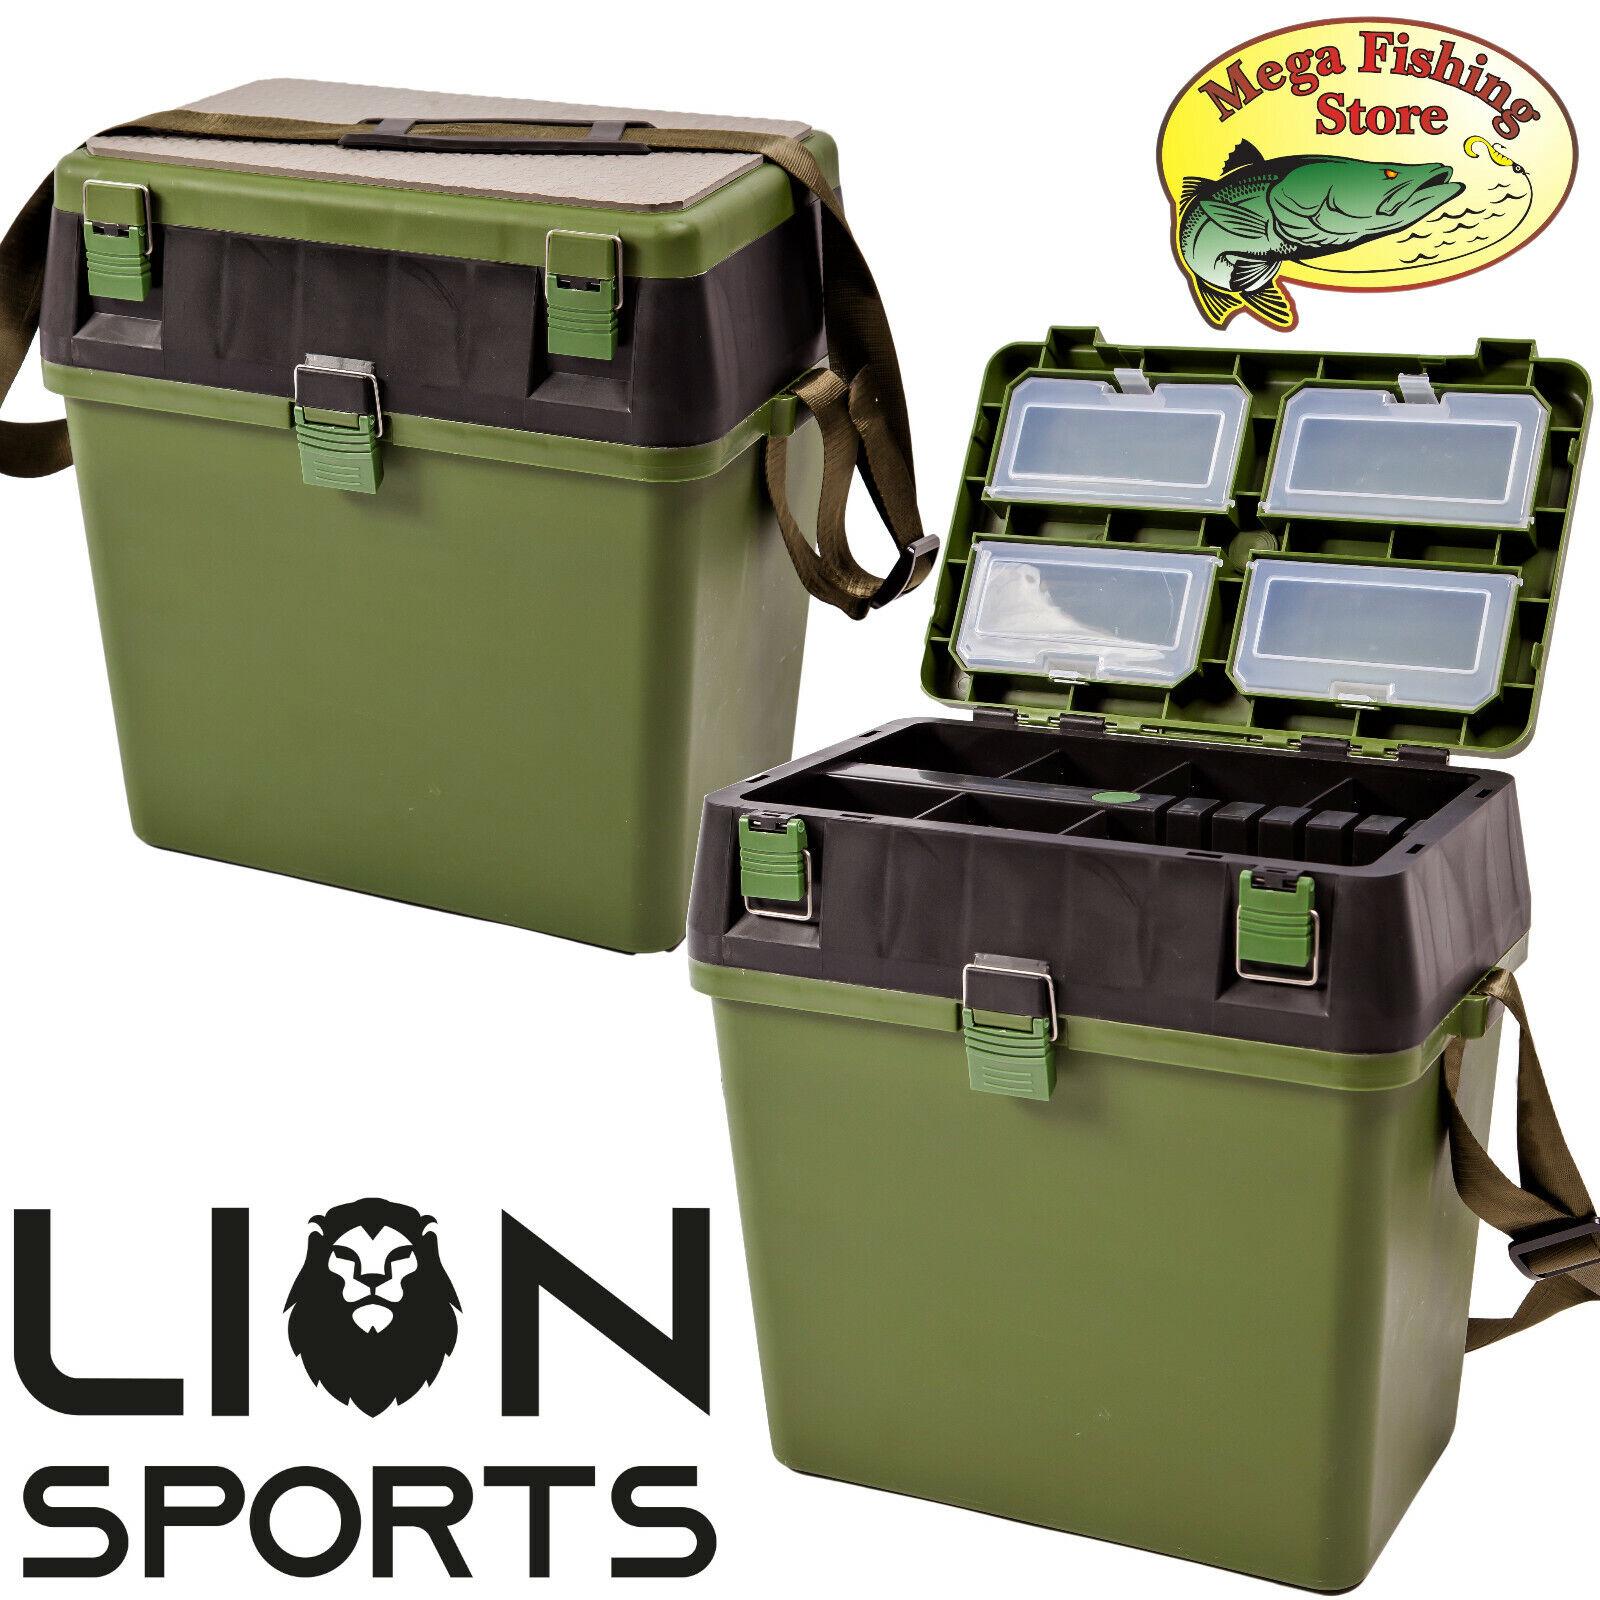 LION Seatbox Angelbox - Sitzkiepe / Tacklebox / Sitzbox Angel Koffer Box Angeln